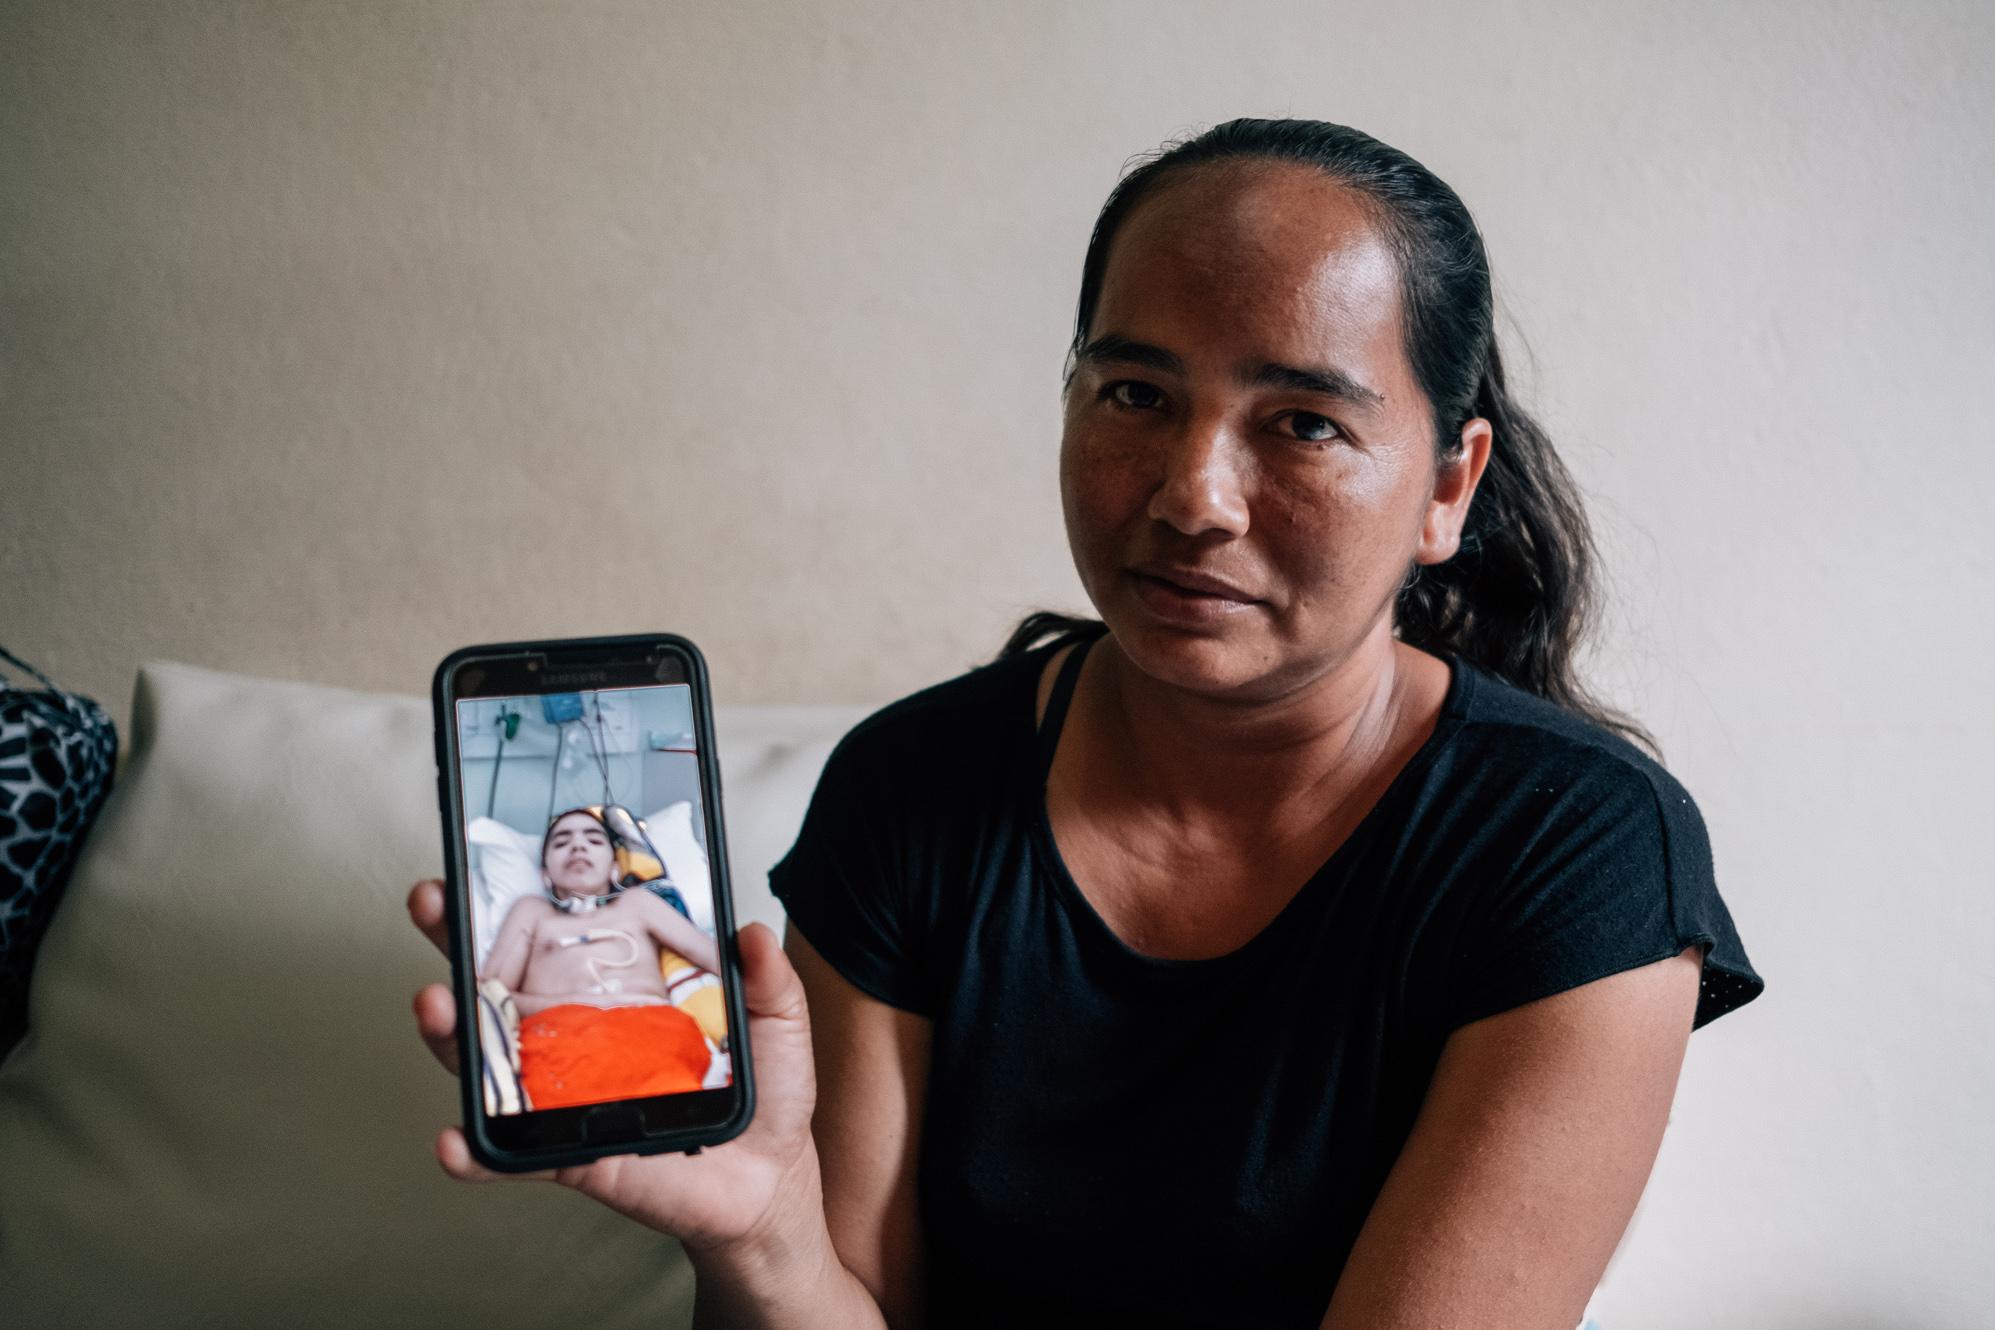 Único sobrevivente de raiva humana no Amazonas é transferido para enfermaria